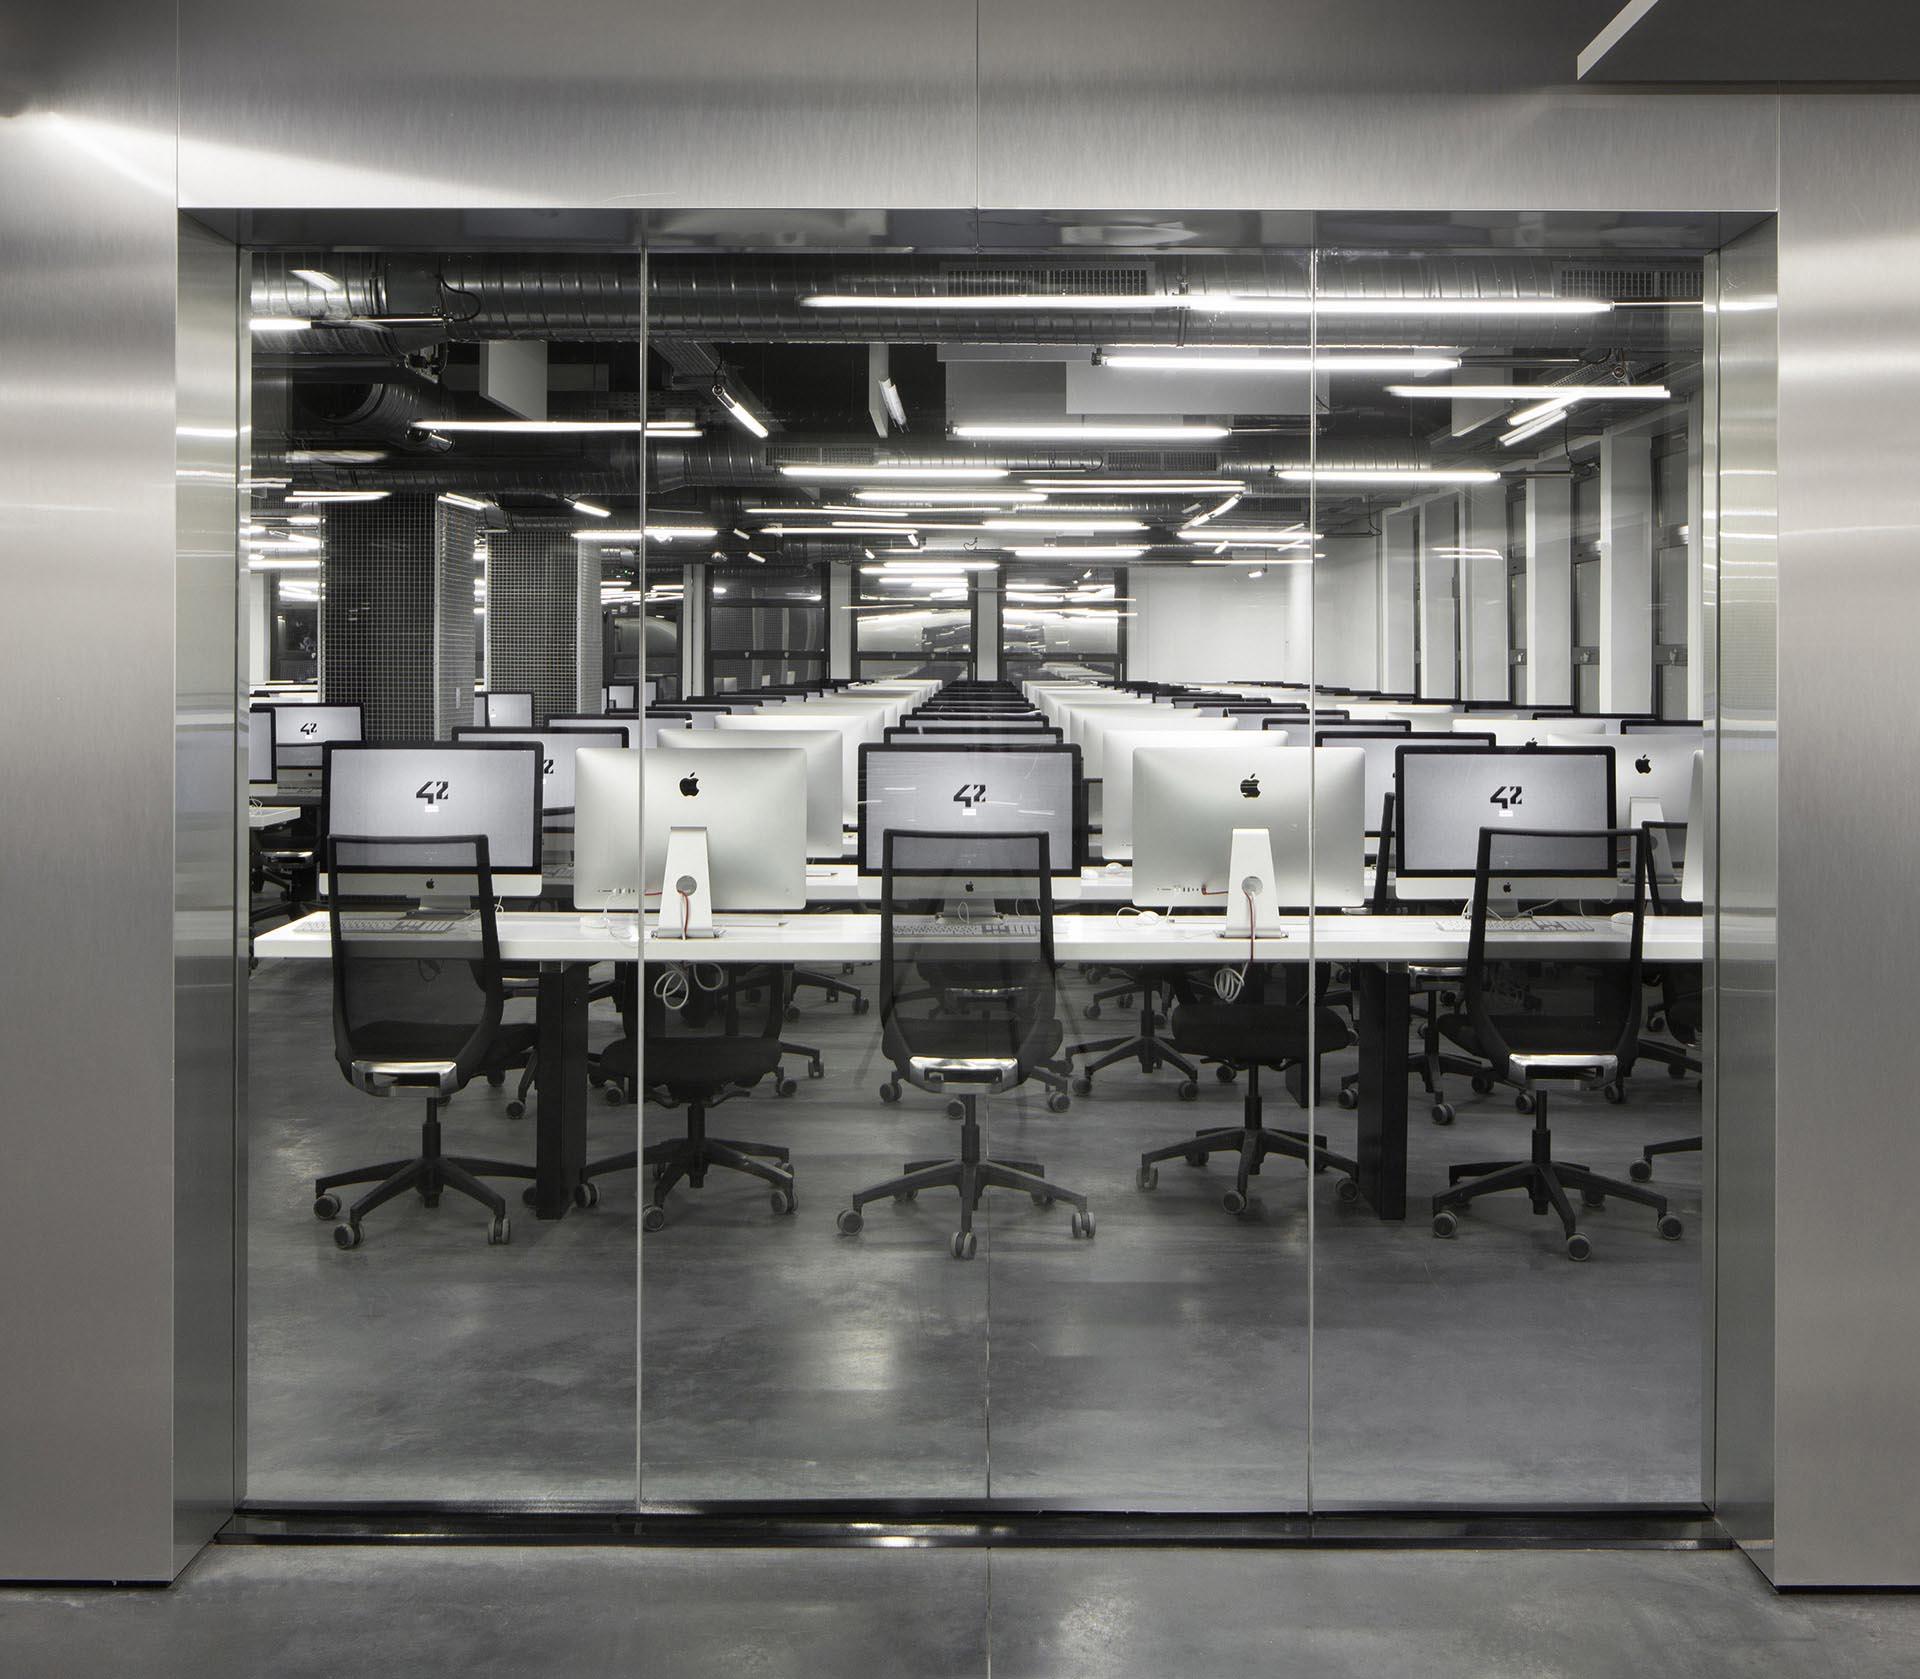 Ecole 42 - NOC 42 - AR Studio Architectures - Xavier NIEL - Kwame YAMGNANE - Florian BUCHER - Nicolas SADIRAC - Free - Reinventer Paris (16).jpg